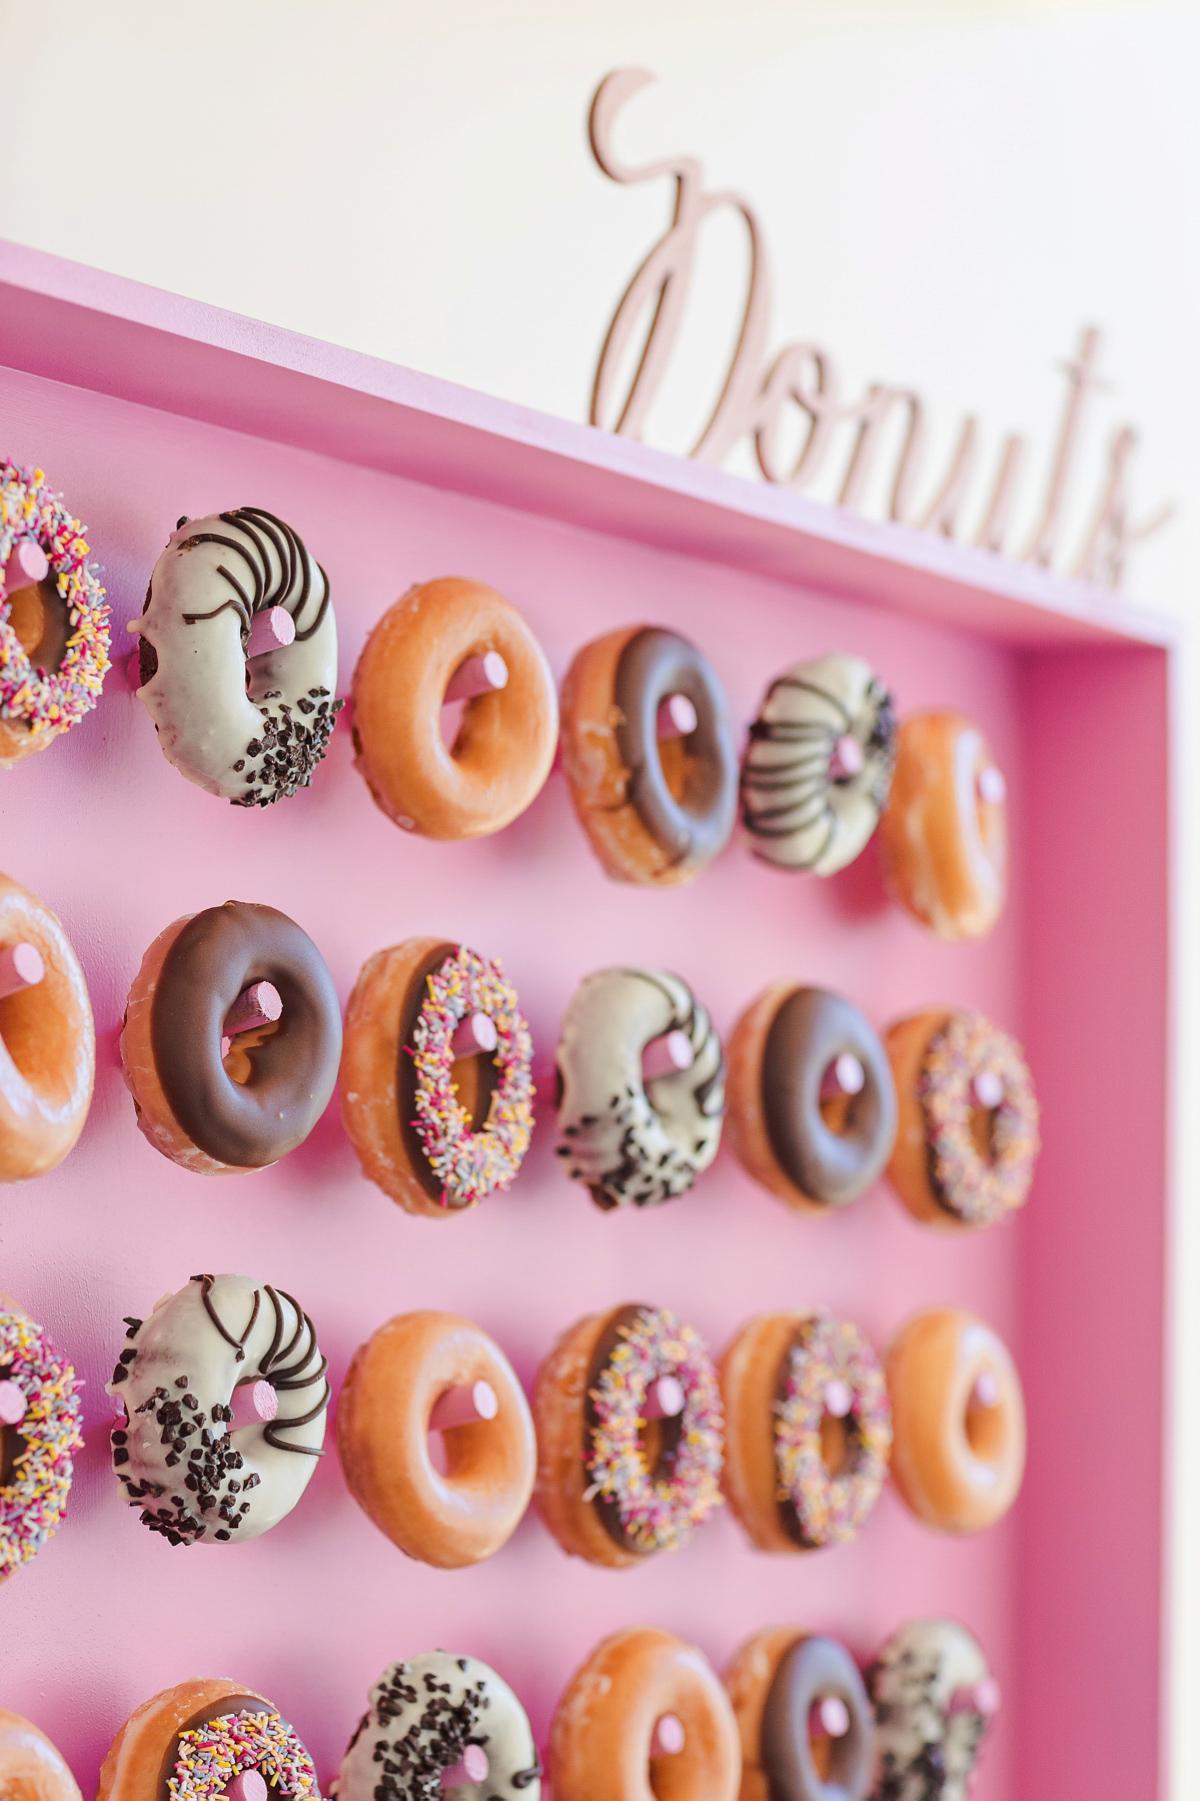 Kalm Kitchen S Donut Wall Liquid Nitrogen Ice Cream Bar